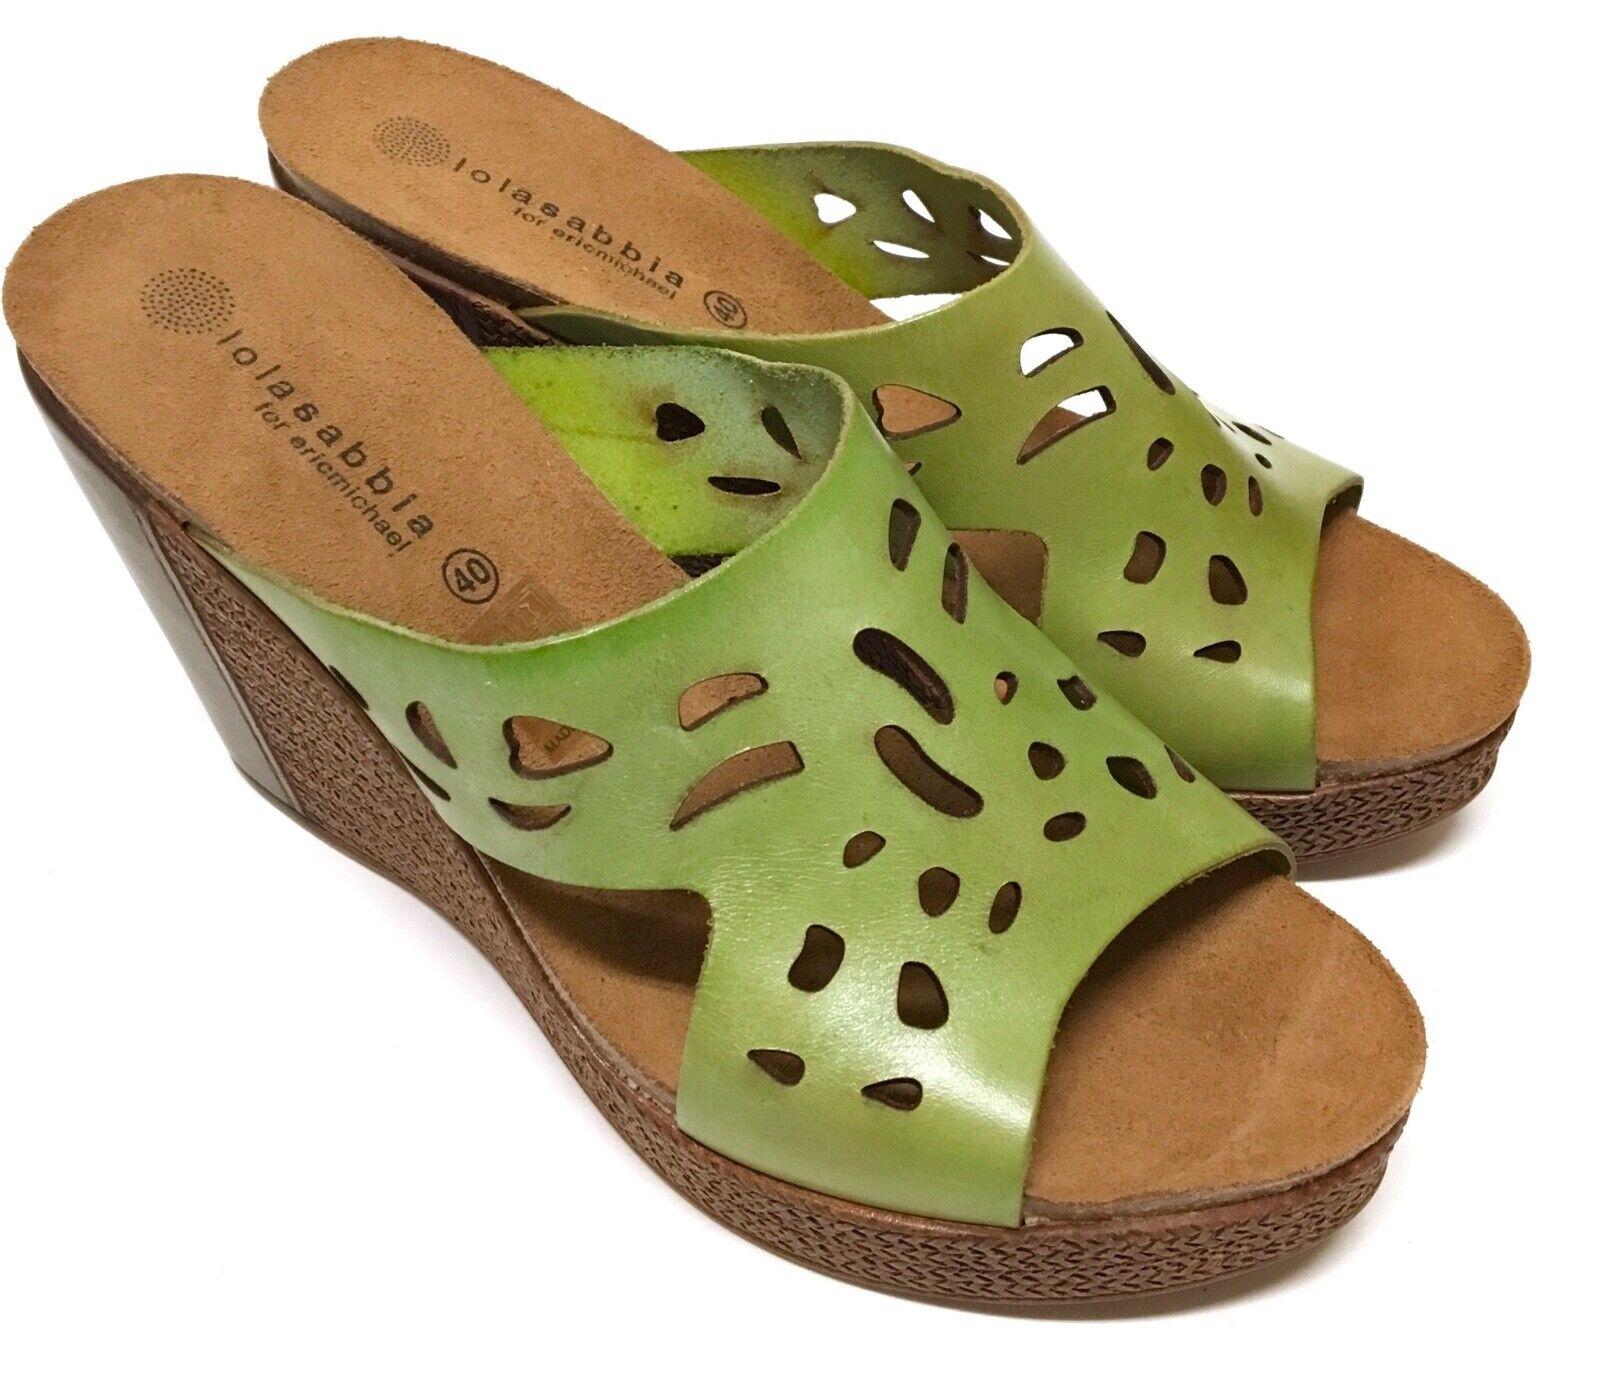 LOLA SABBIA For Eric Michael Women's Size 40 Green Peep Toe